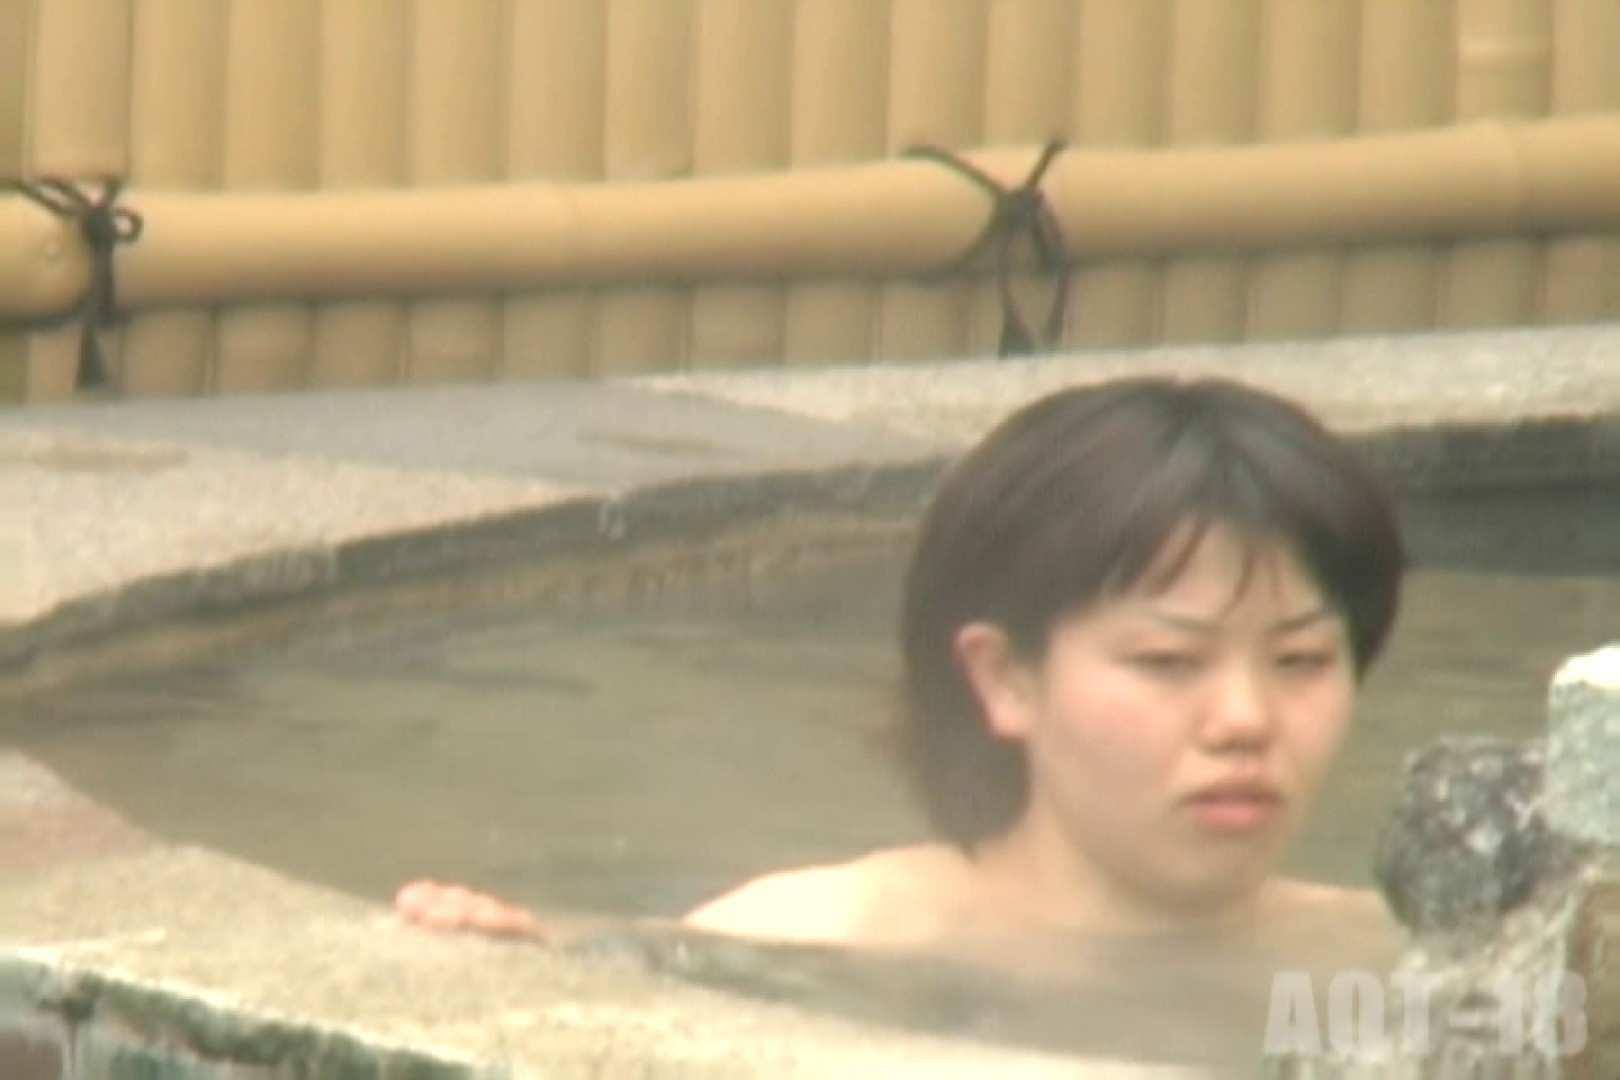 Aquaな露天風呂Vol.861 盗撮  107連発 75